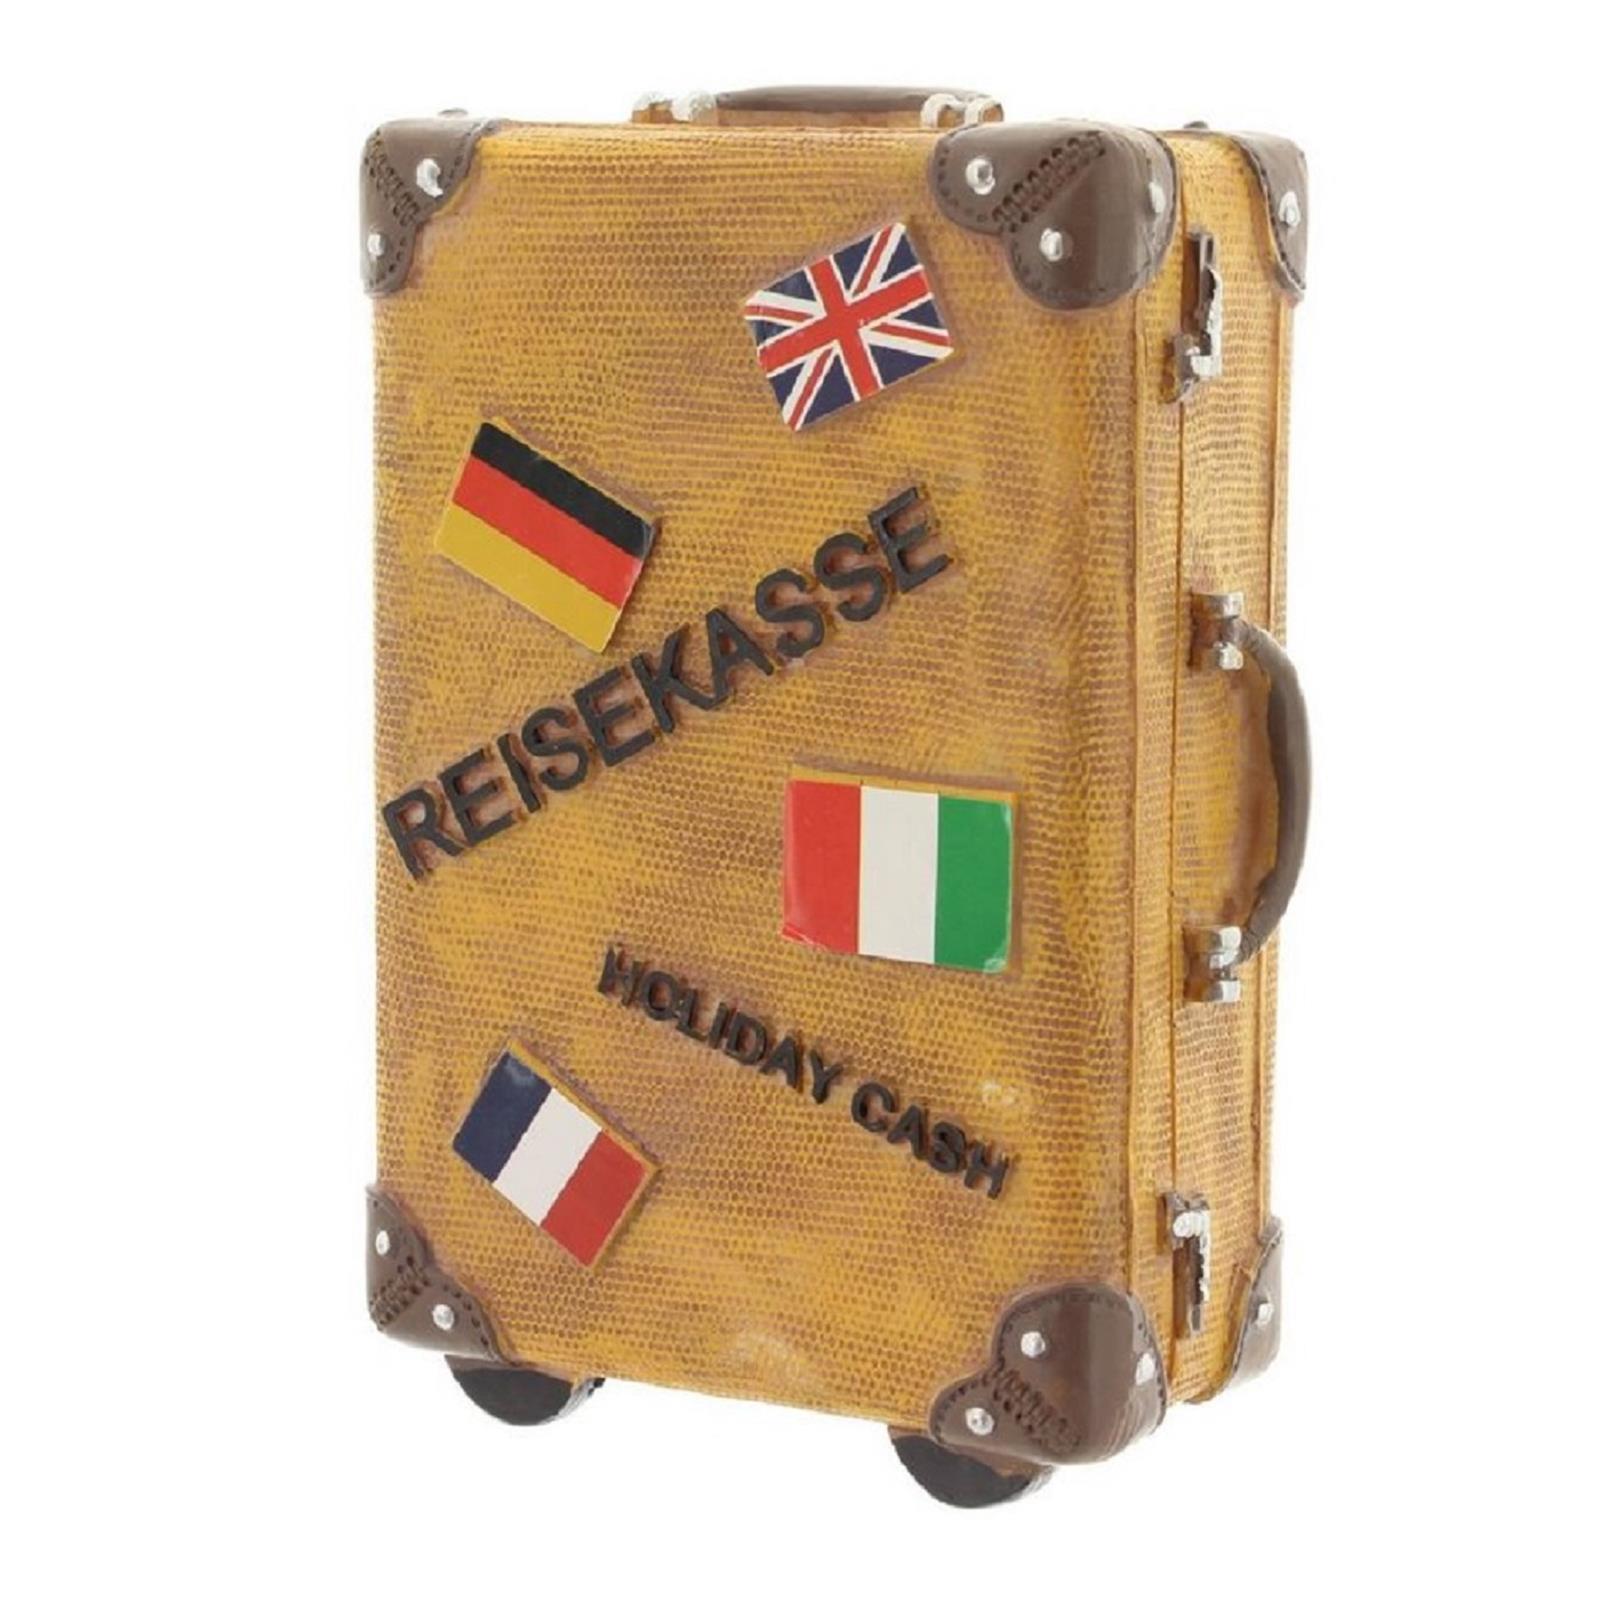 Spardose Reisekoffer Braun